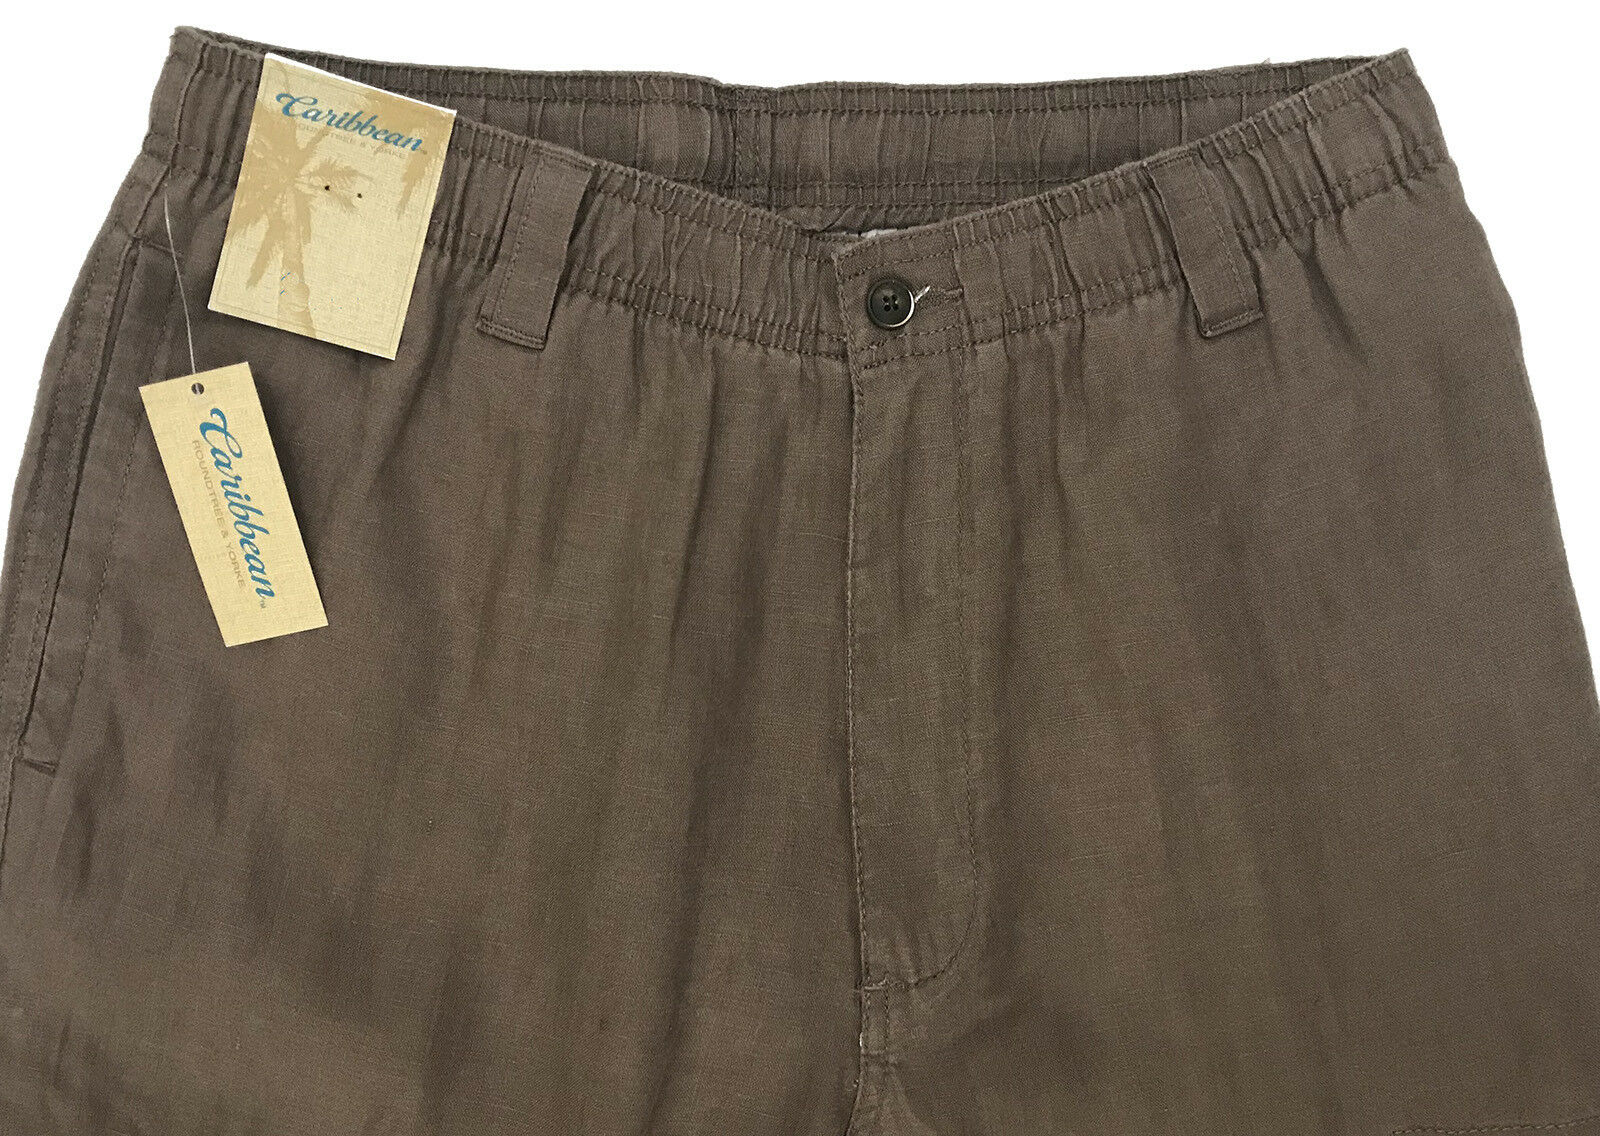 Men's CARIBBEAN Dusty Brown LINEN Drawstring Pants 38x30 NEW NWT Cargo NICE